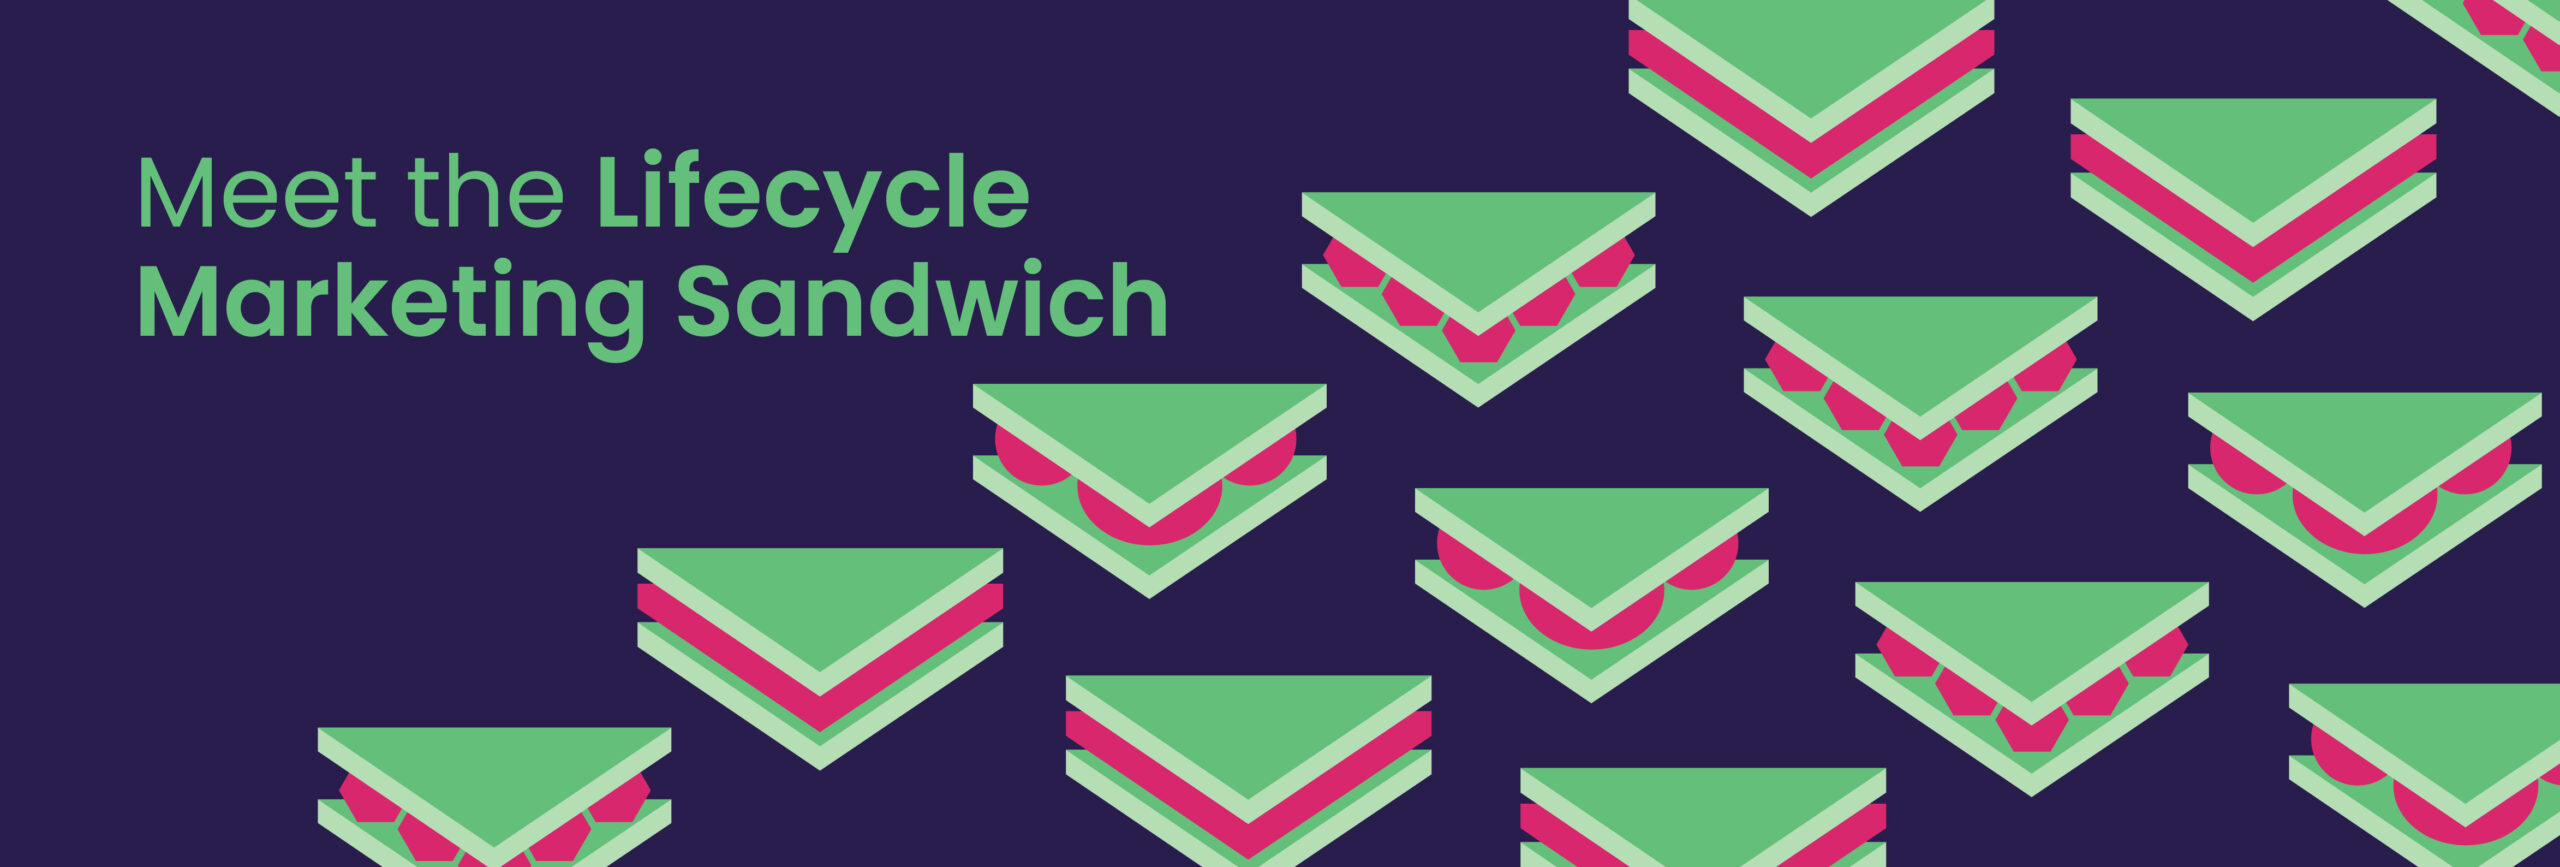 enterprise lifecycle marketing cdp